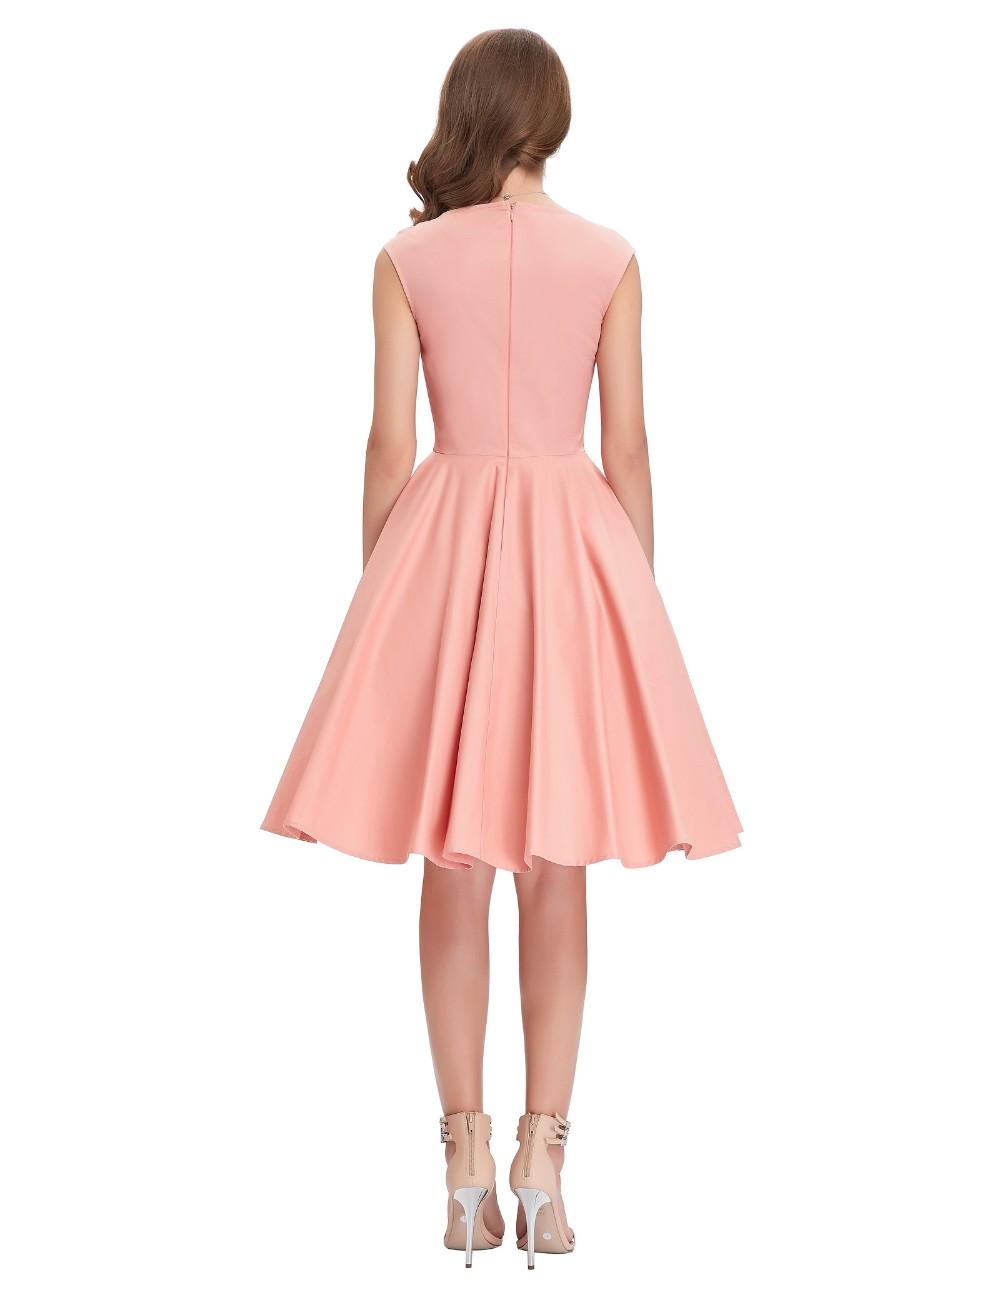 Rojo rosa verde negro Rockabilly Vestido ocasional mujeres Belle ...